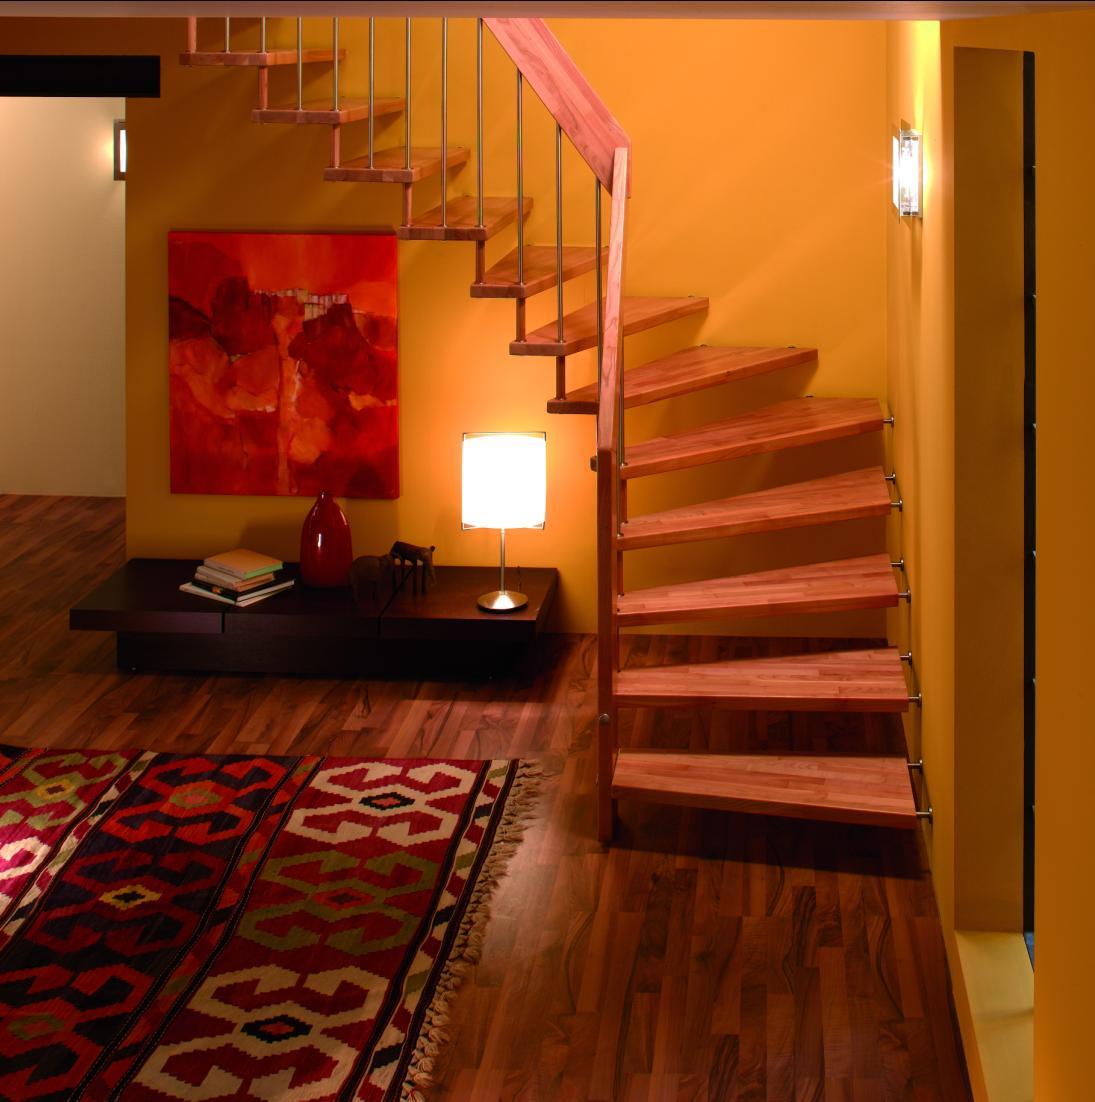 14 Staircases Design Ideas: ESCALIER SUSPENDU